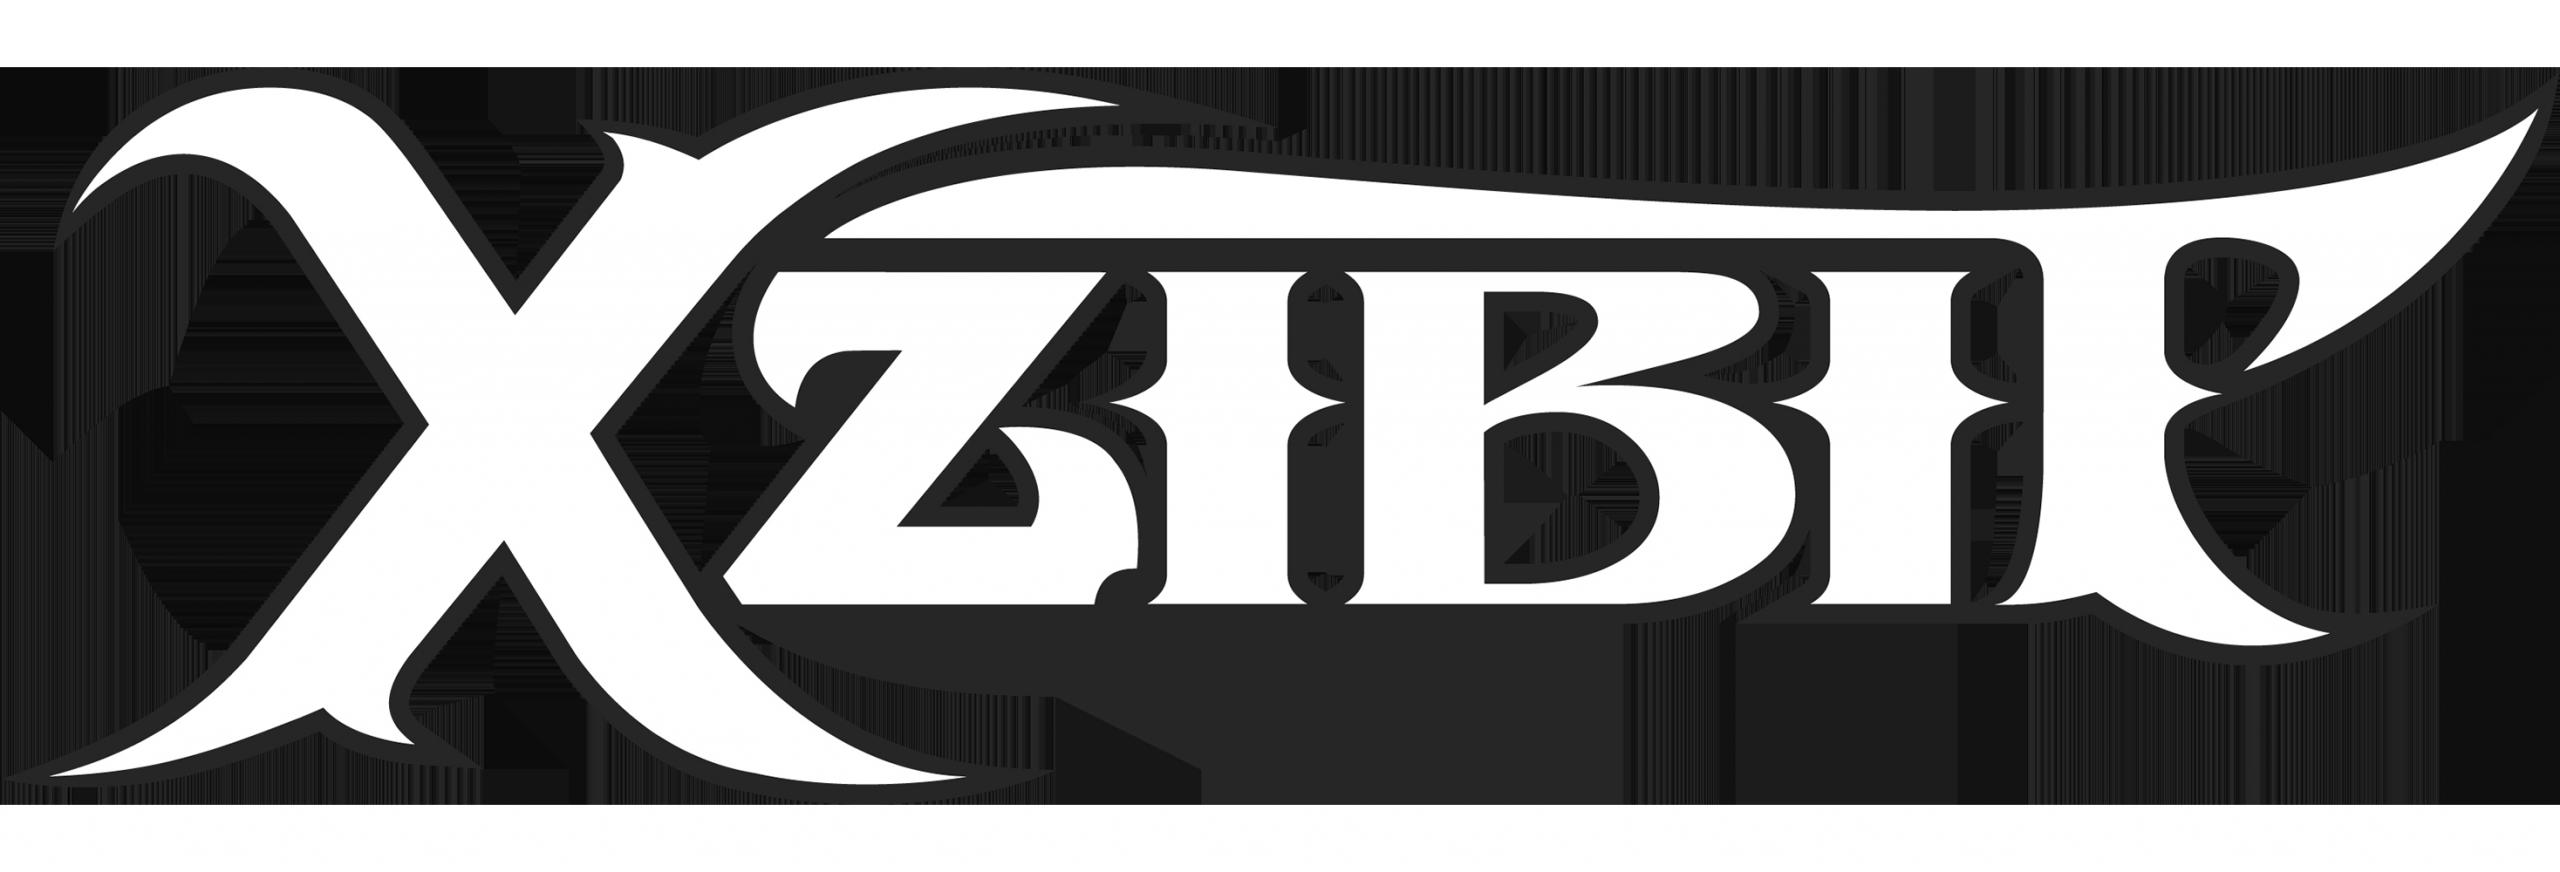 X-Zibit-logo